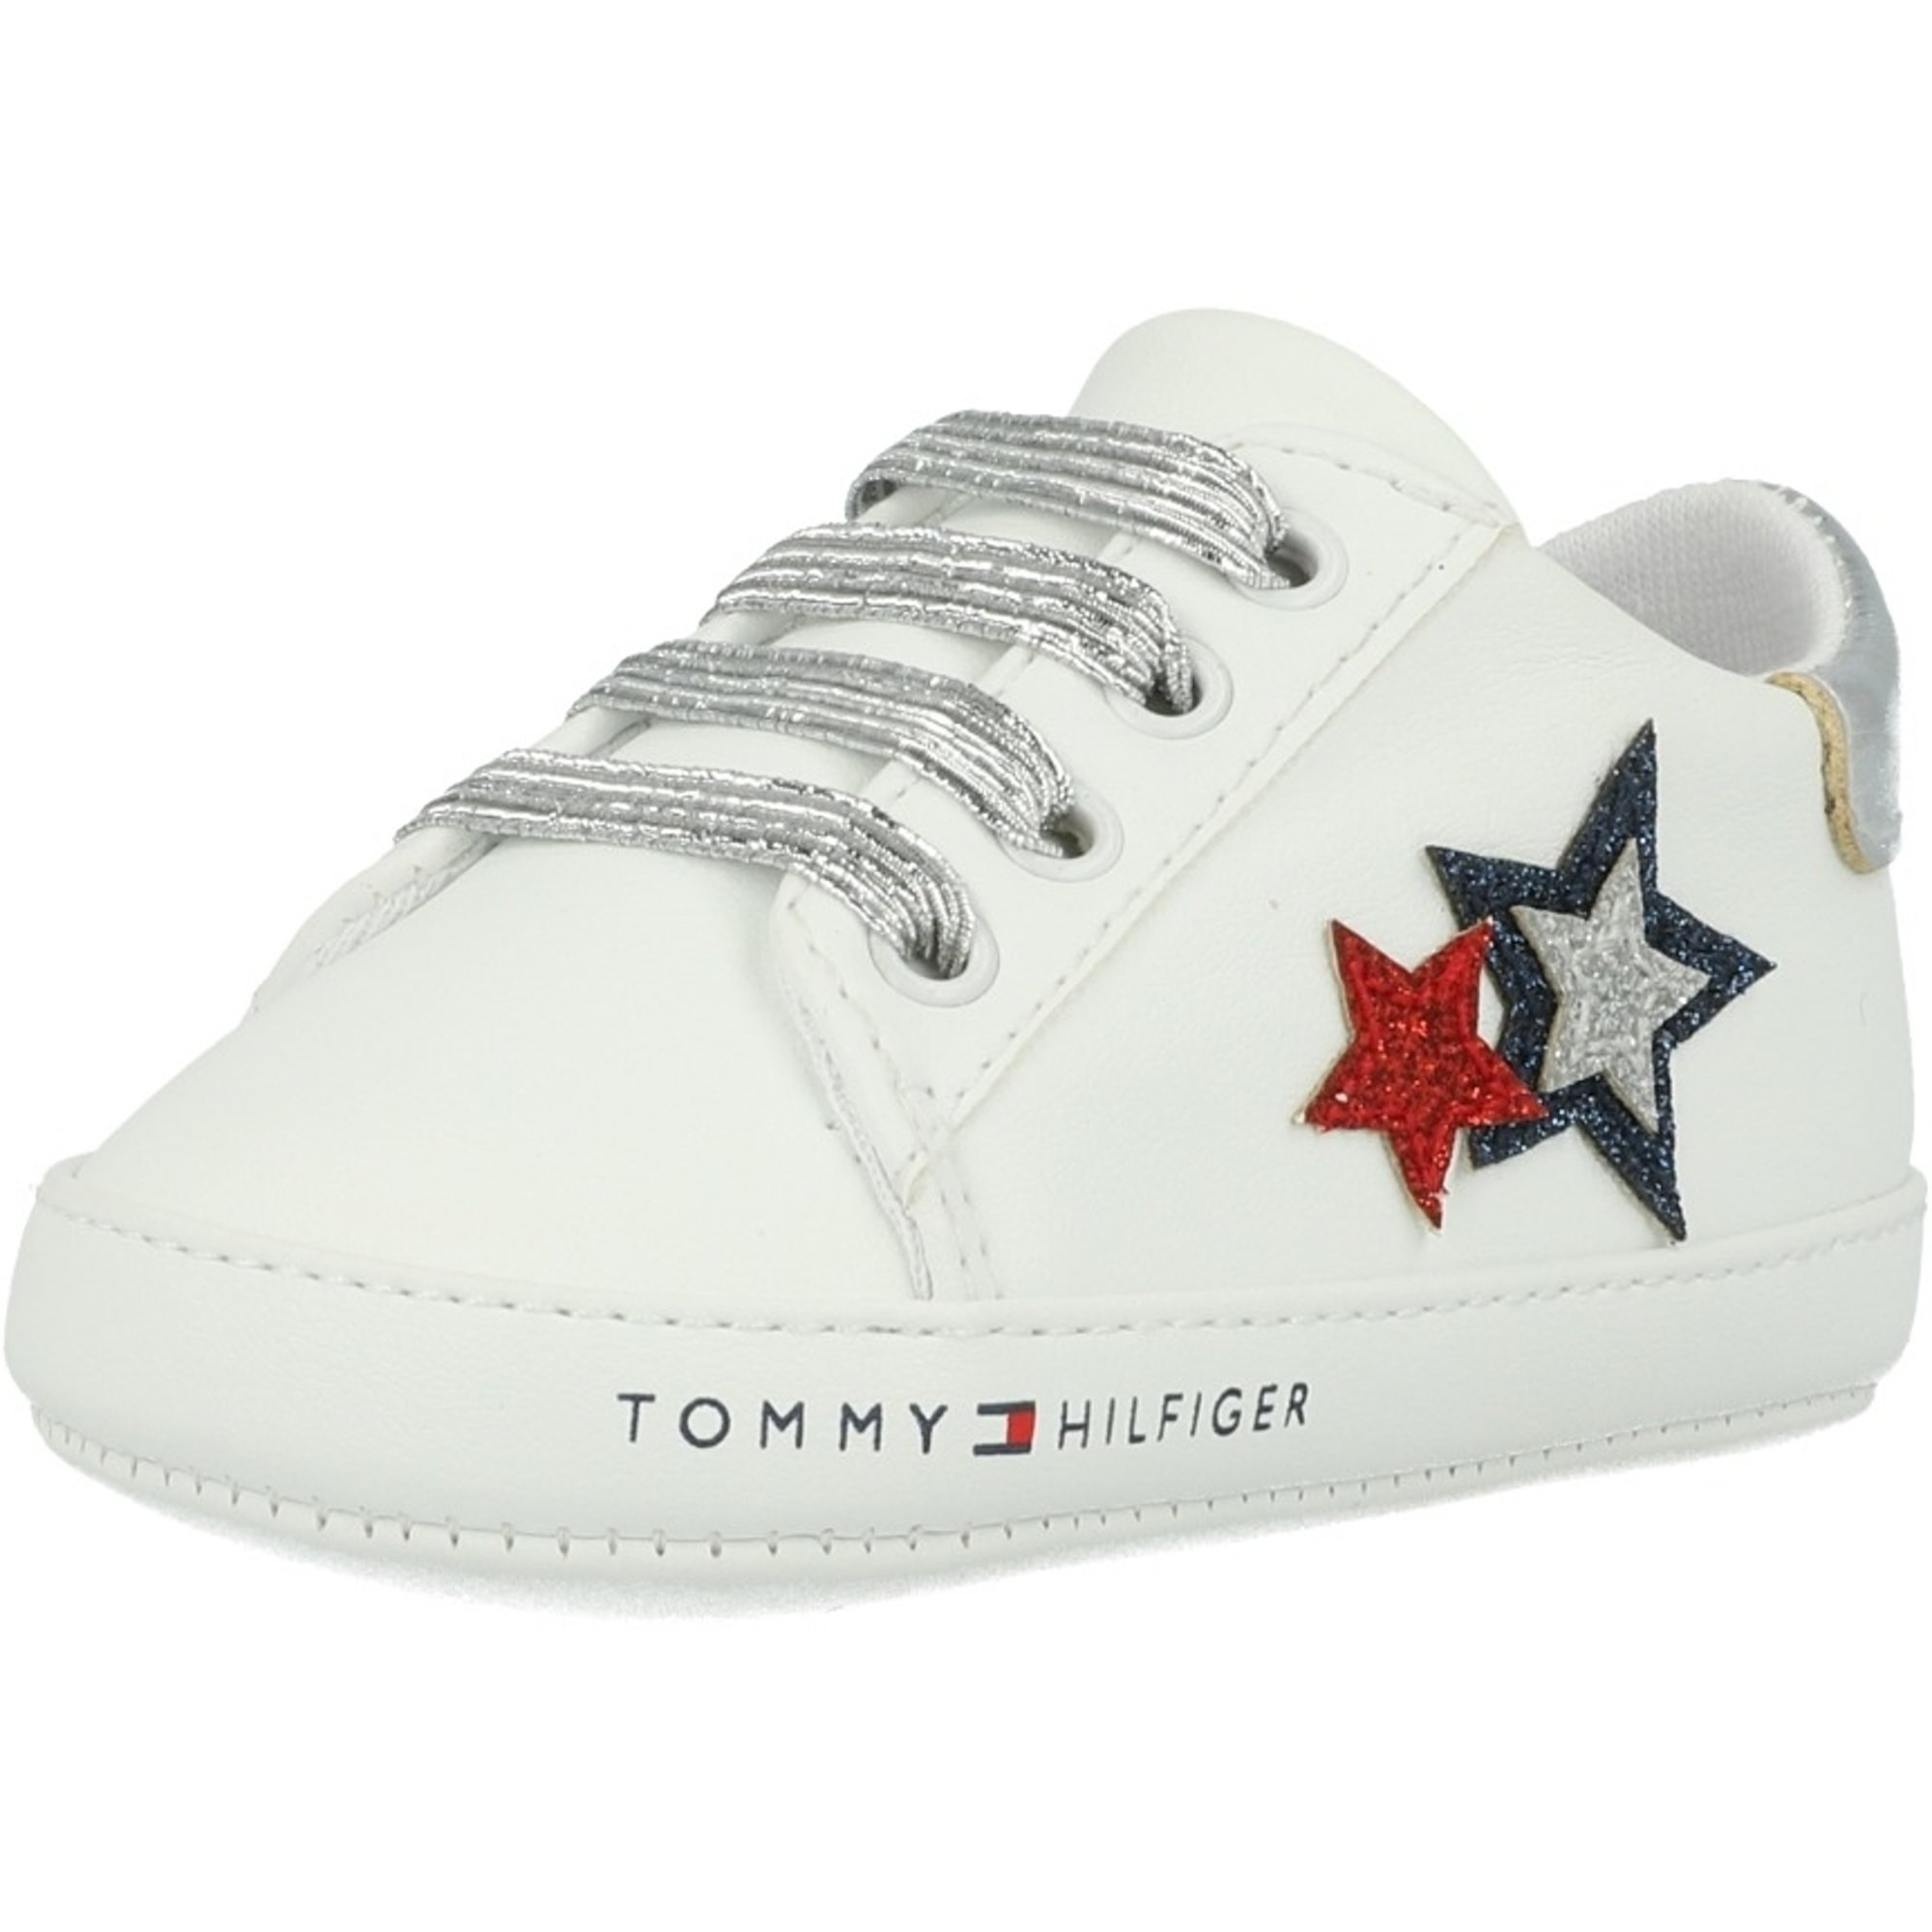 Tommy Hilfiger Crib White/Blue Textile